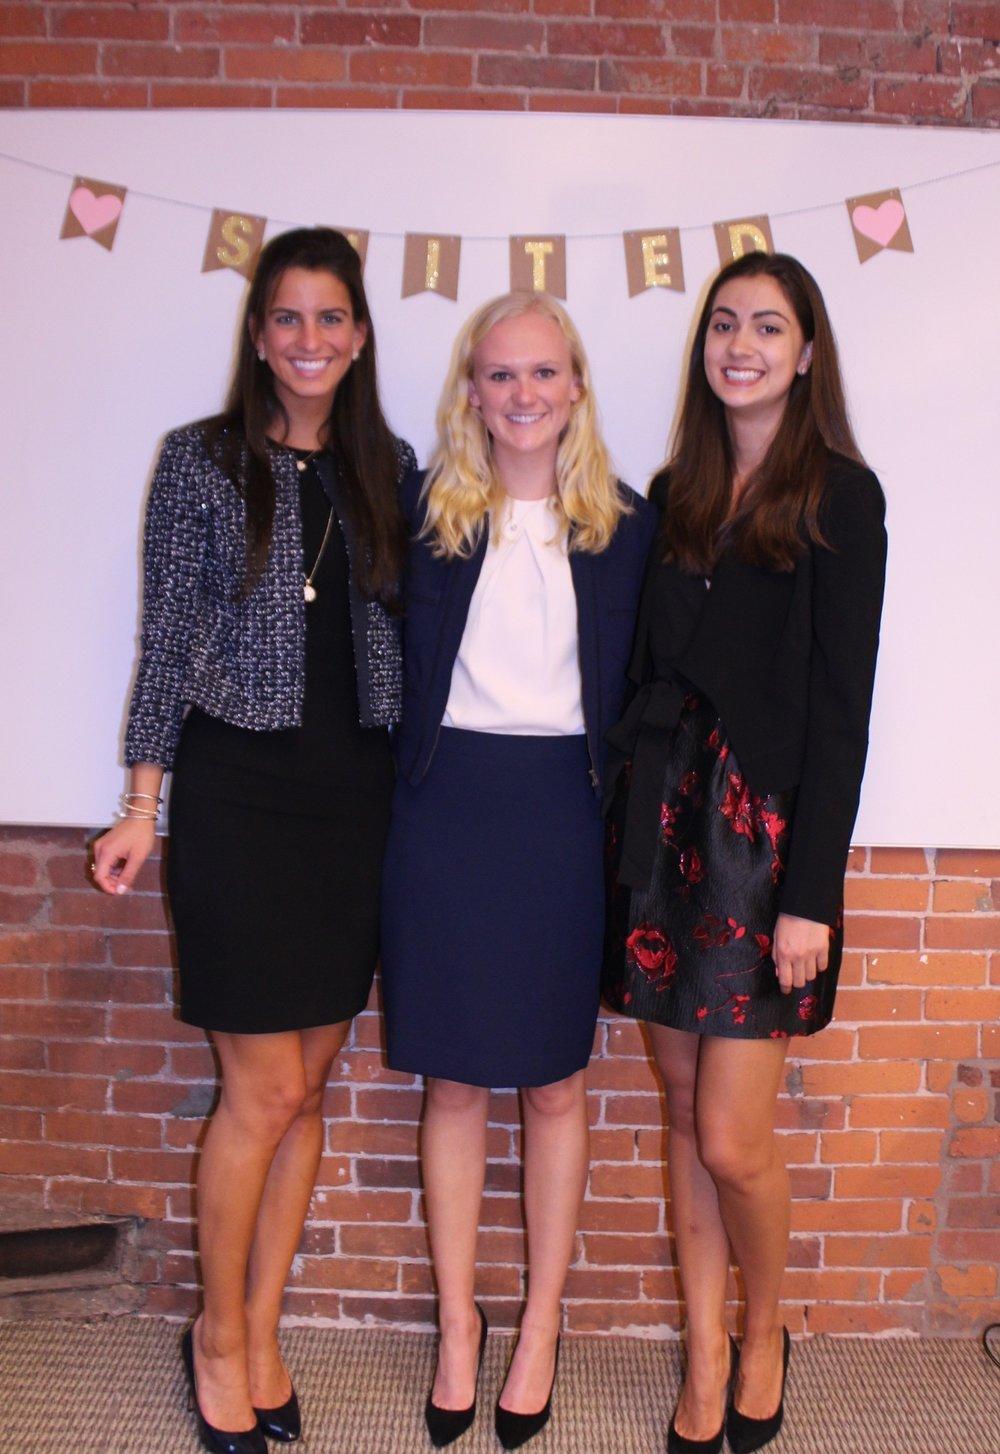 Suited's three undergraduate ambassadors: Lexi Henkel, Miranda McKay and Maya Rodriguez.